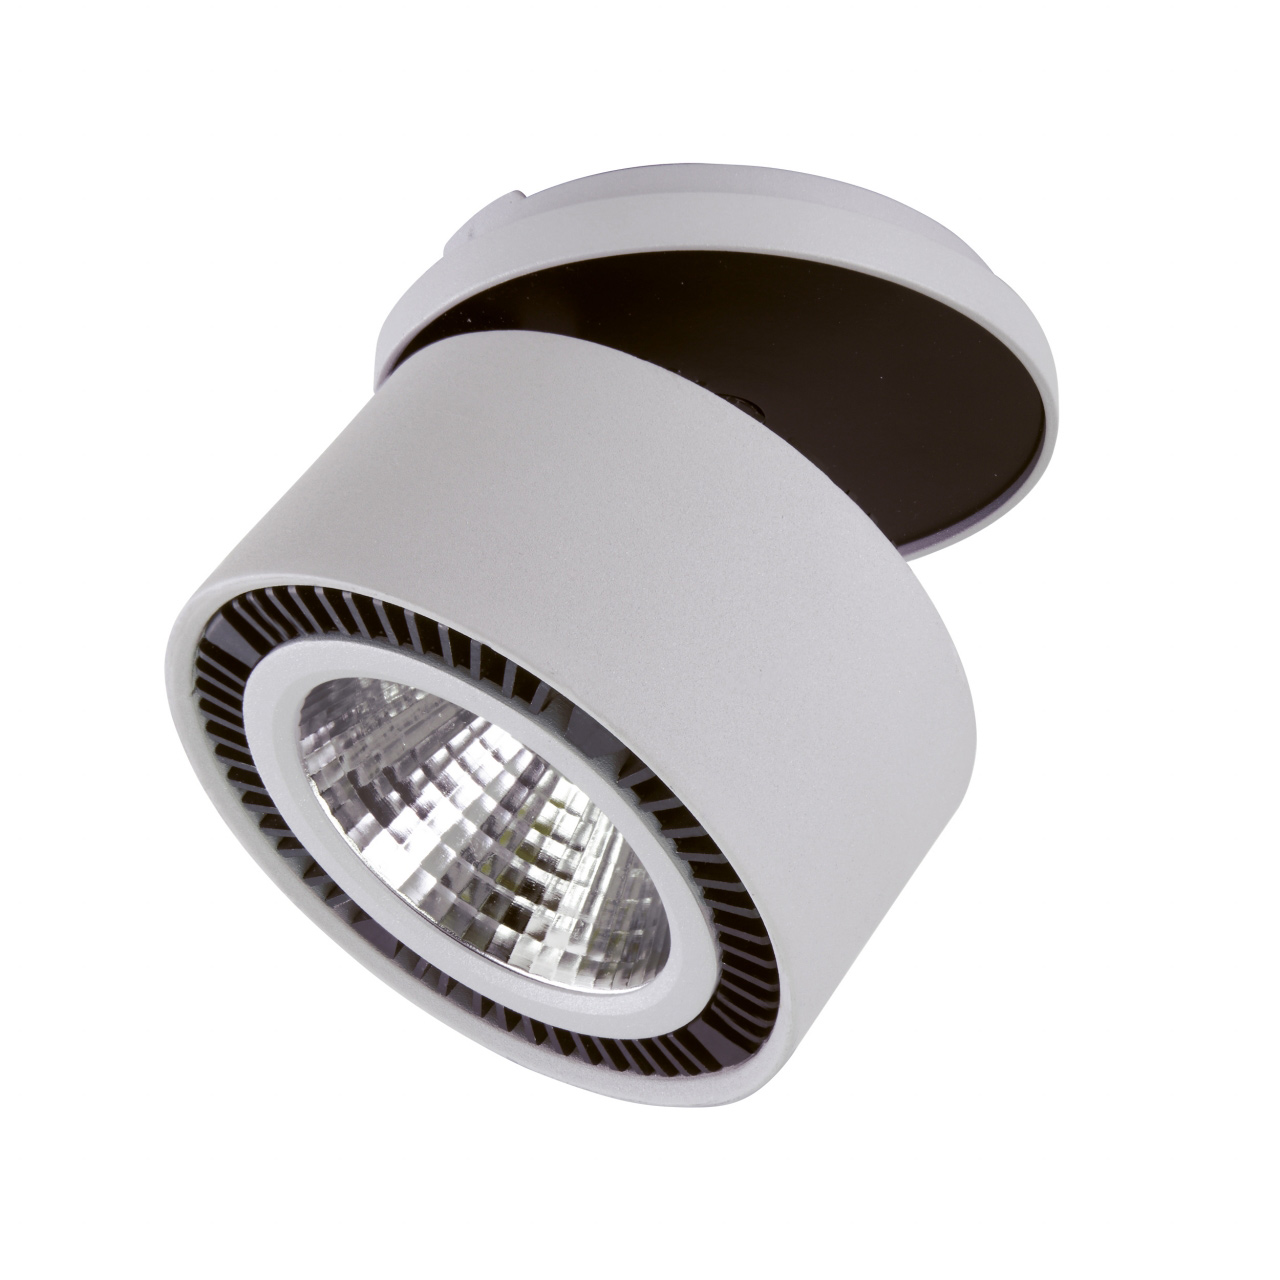 Светильник Forte inca LED 40W 3400LM 30G белый 4000K Lightstar 214840